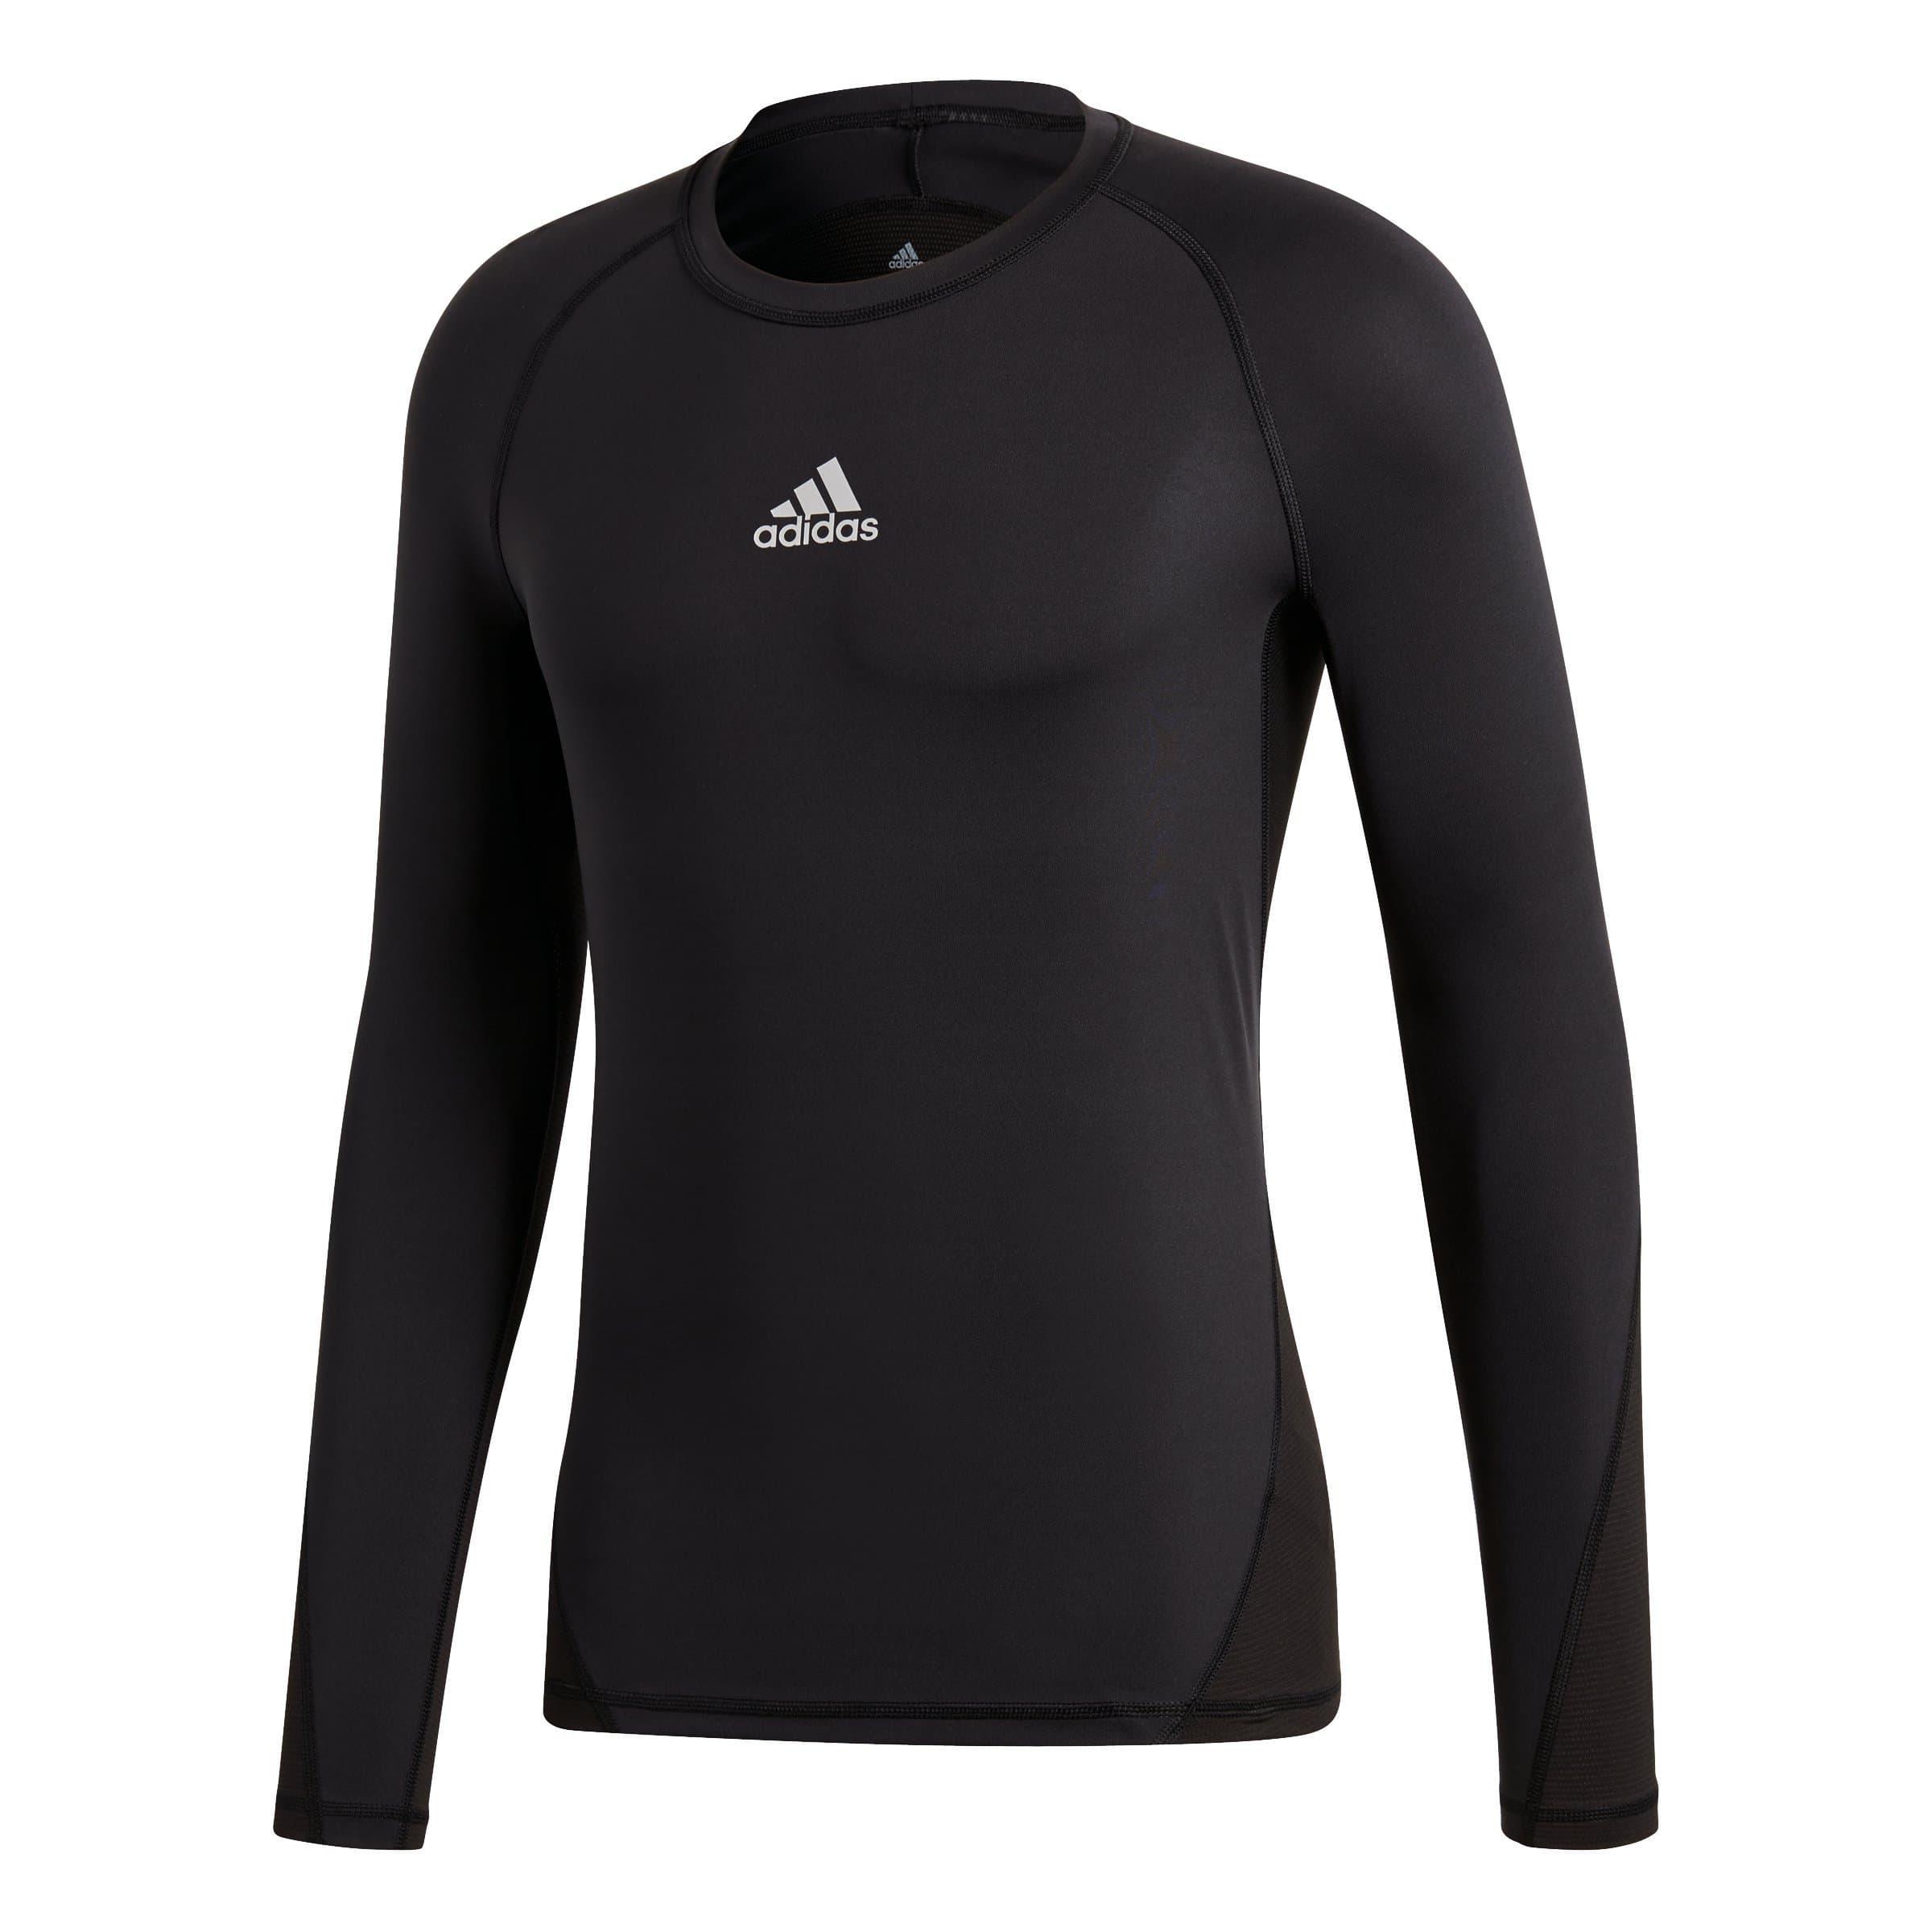 Adidas Ask Sport Longsleeve Tee Maglietta da uomo a compressione